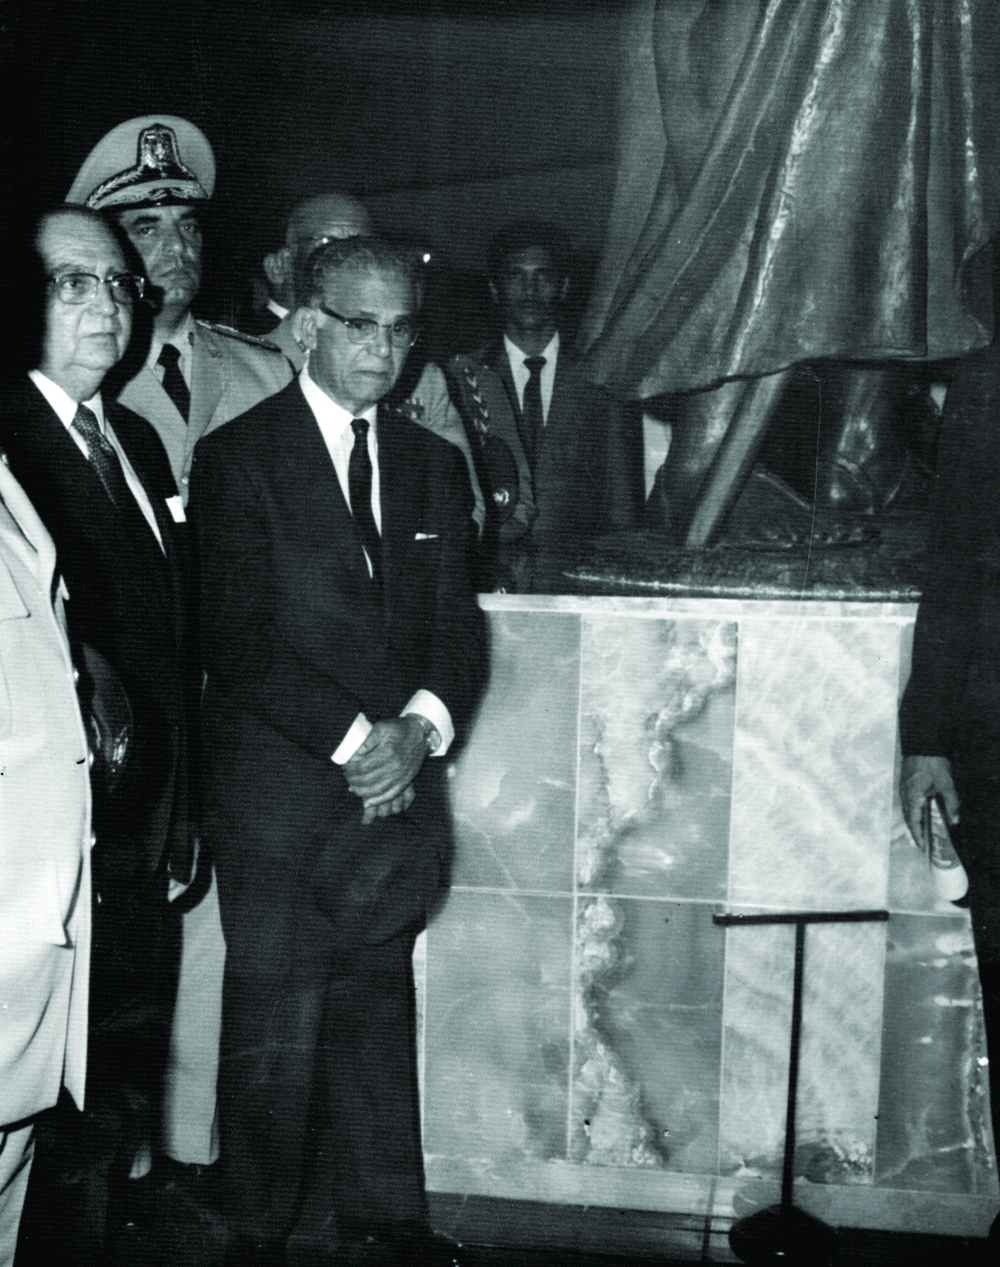 José Antonio Caro Álvarez junto al Presidente Joaquín Balaguer